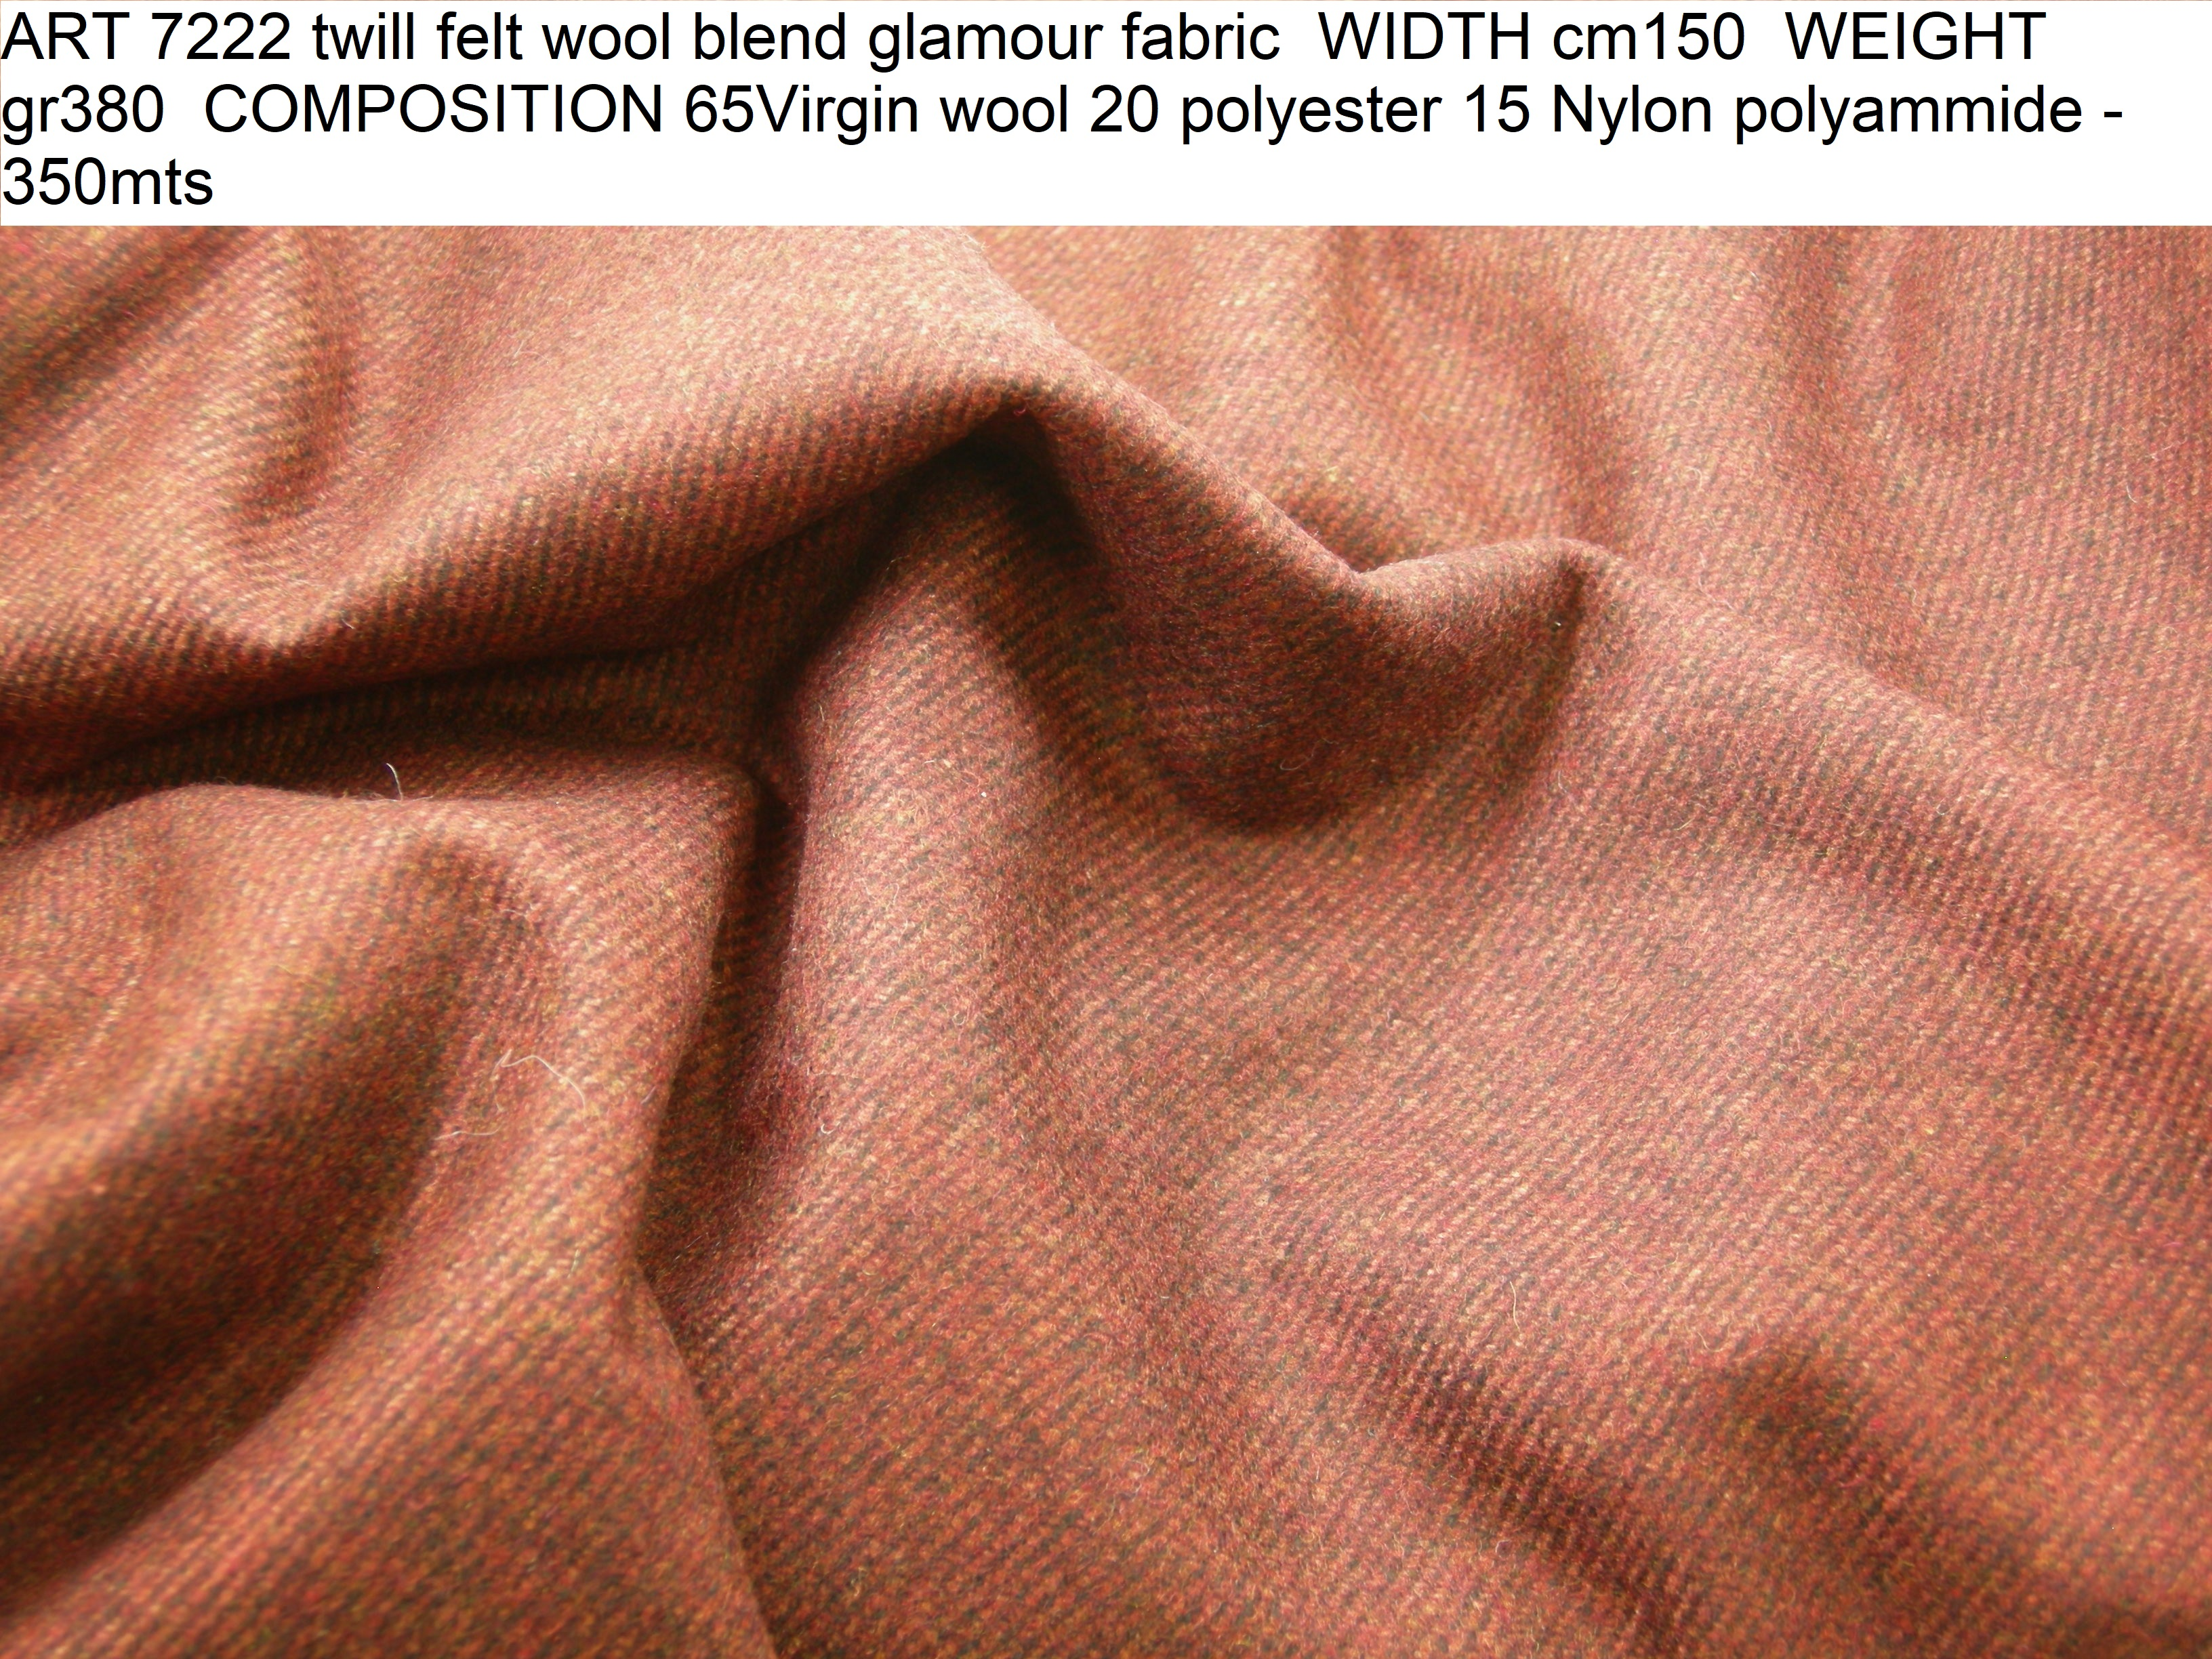 ART 7222 twill felt wool blend glamour fabric WIDTH cm150 WEIGHT gr380 COMPOSITION 65Virgin wool 20 polyester 15 Nylon polyammide - 350mts